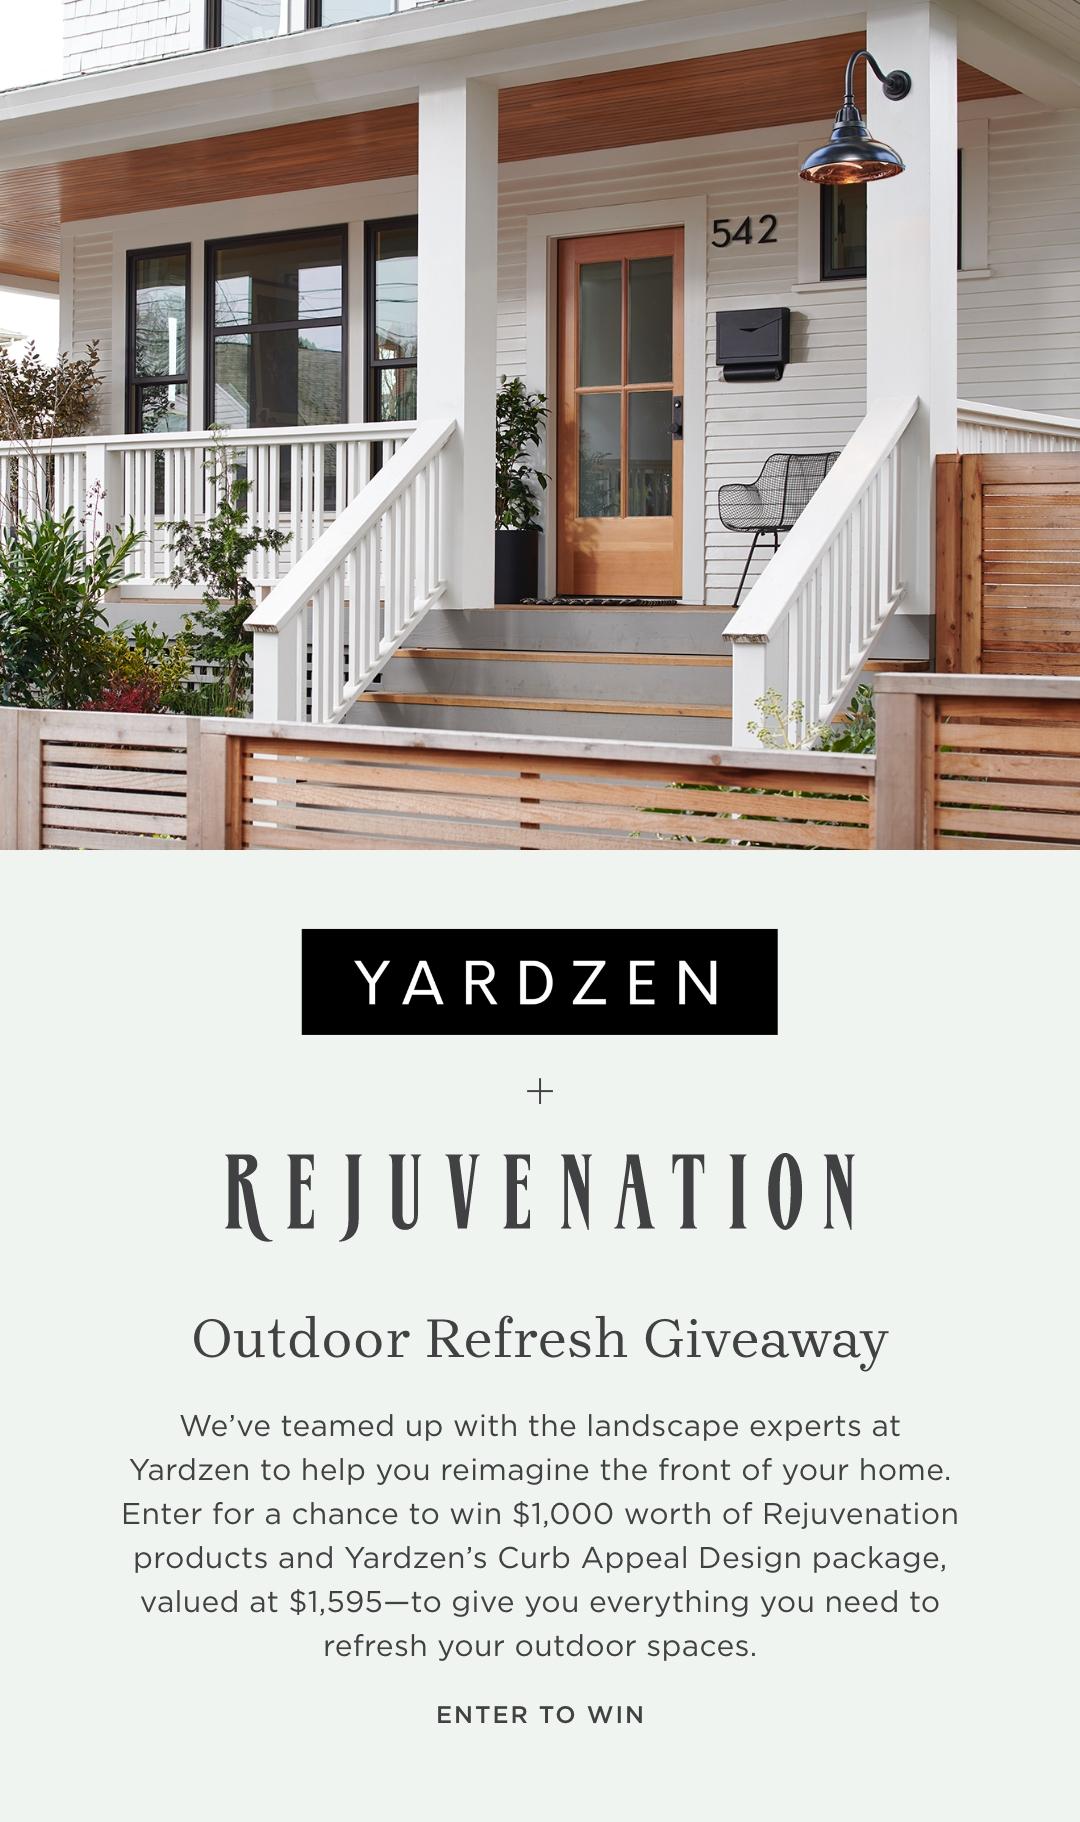 Learn More About Yardzen + Rejuvenation